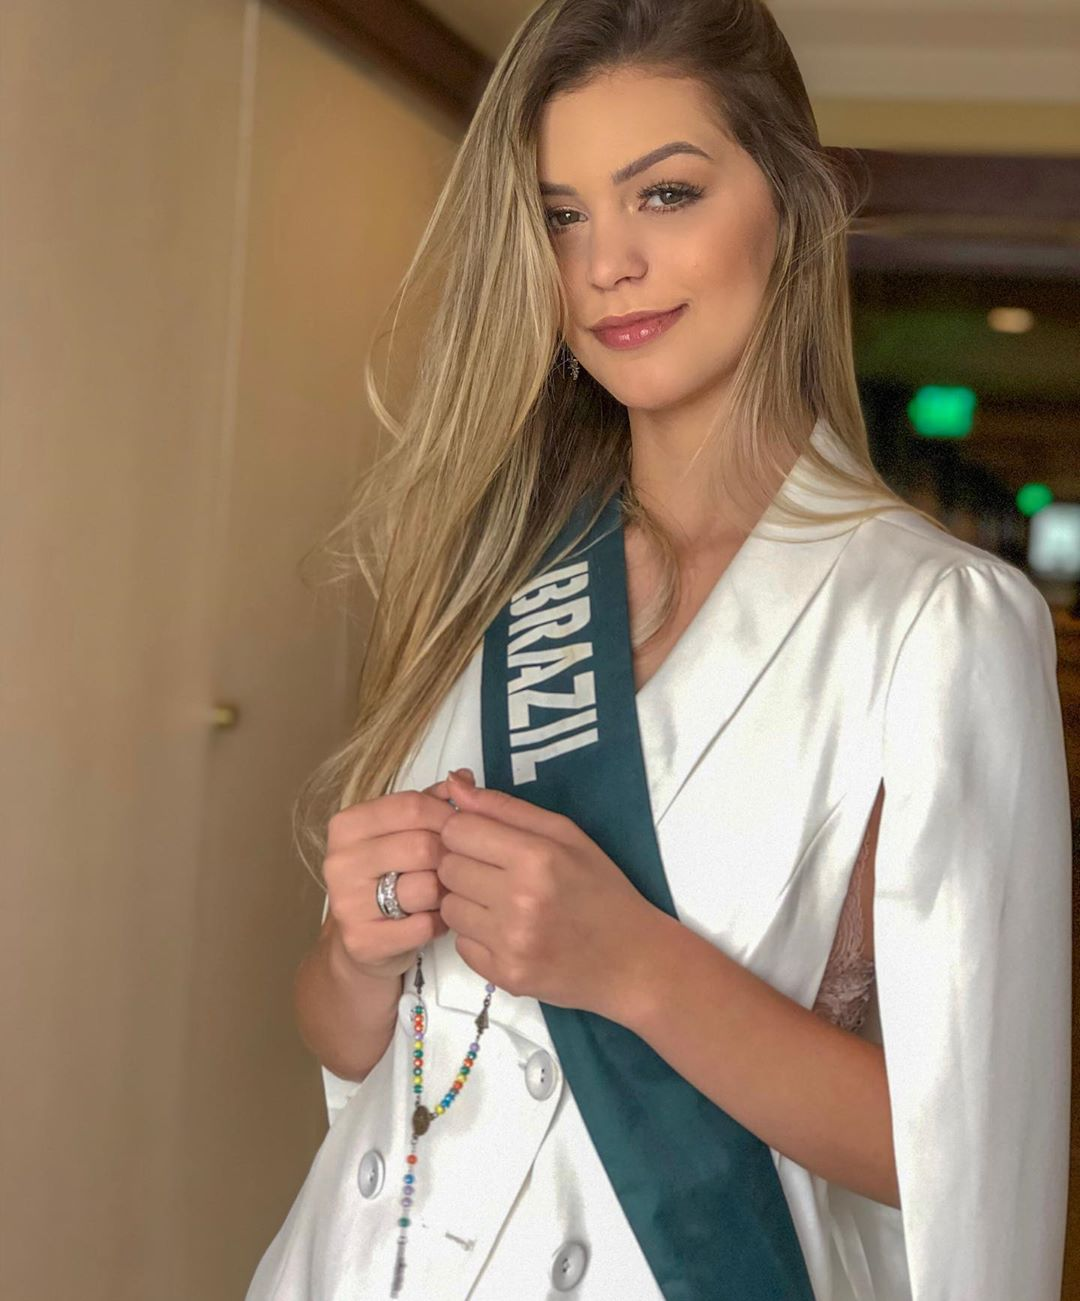 maria gabriela batistela, miss brasil terra 2019. - Página 20 75272110